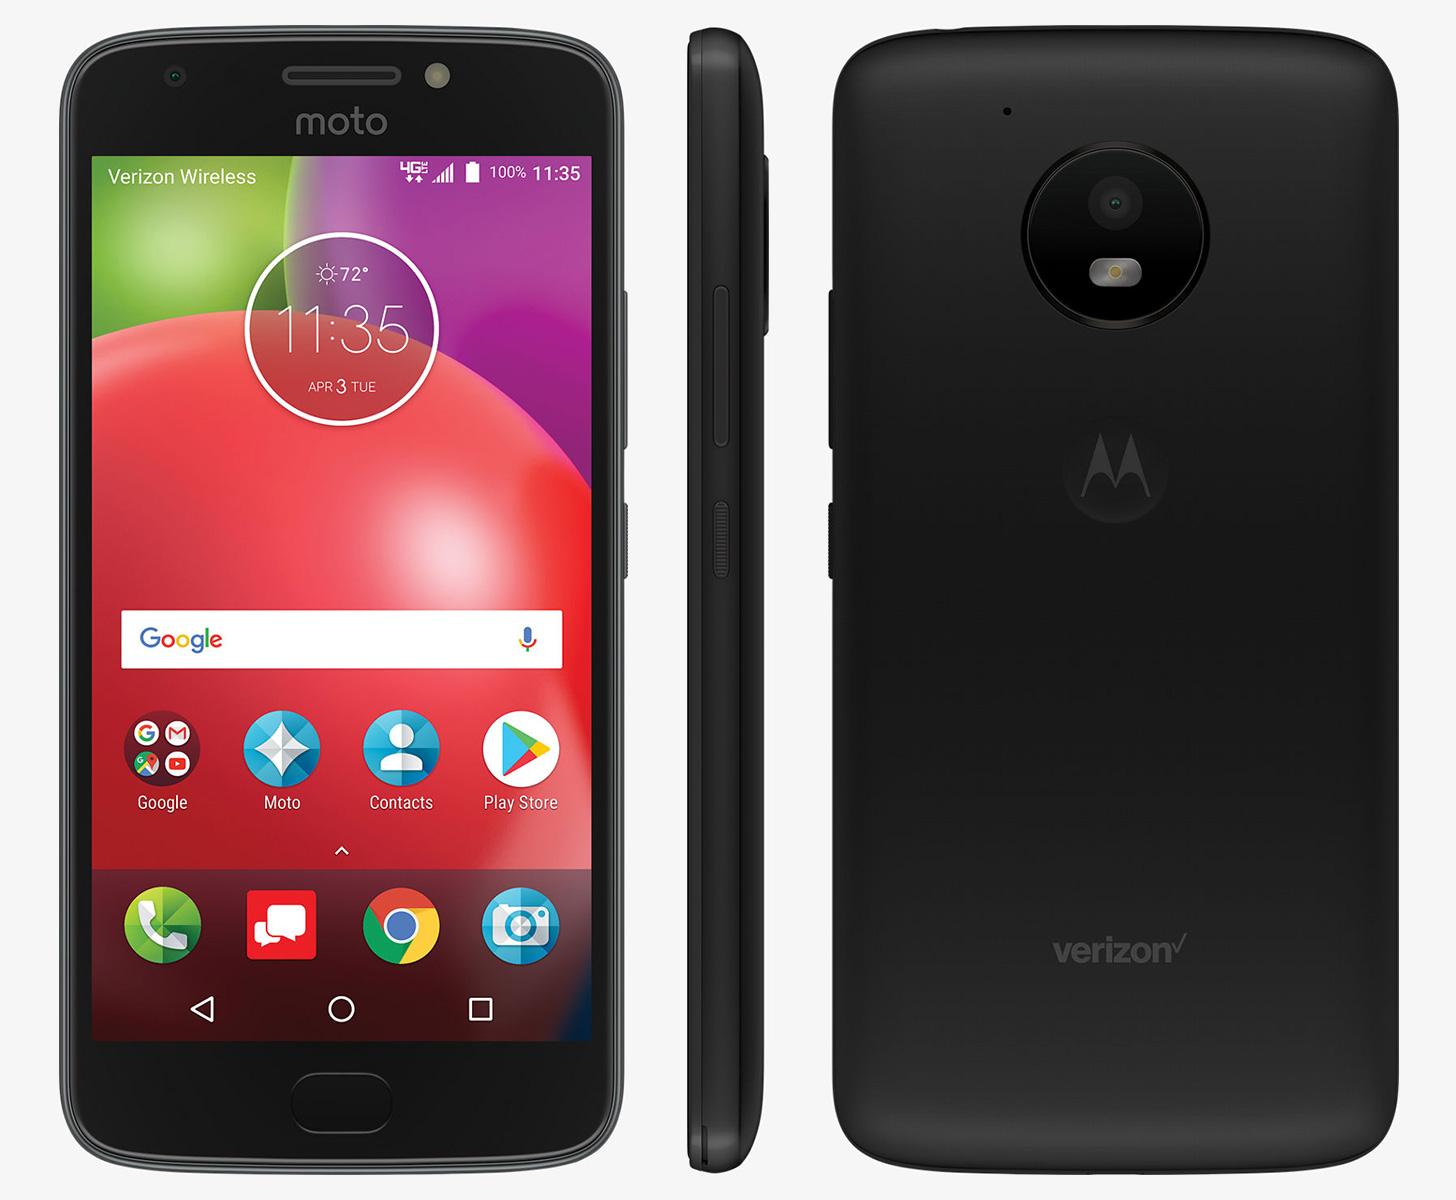 Verizon Cell Phone Business Plans